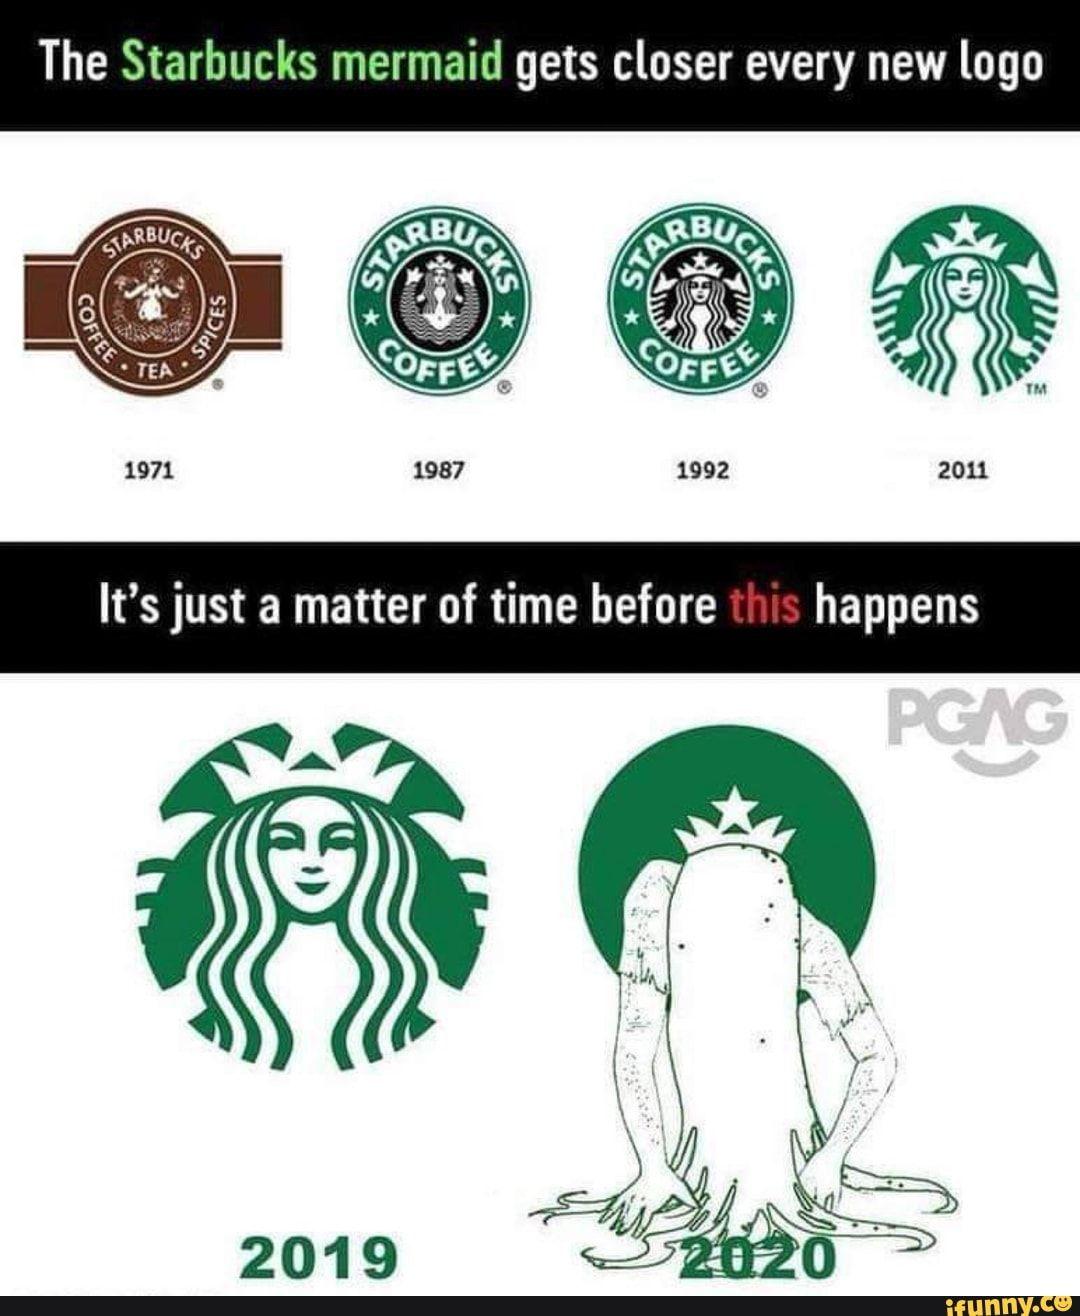 The Starbucks mermaid gets closer every new logo iFunny